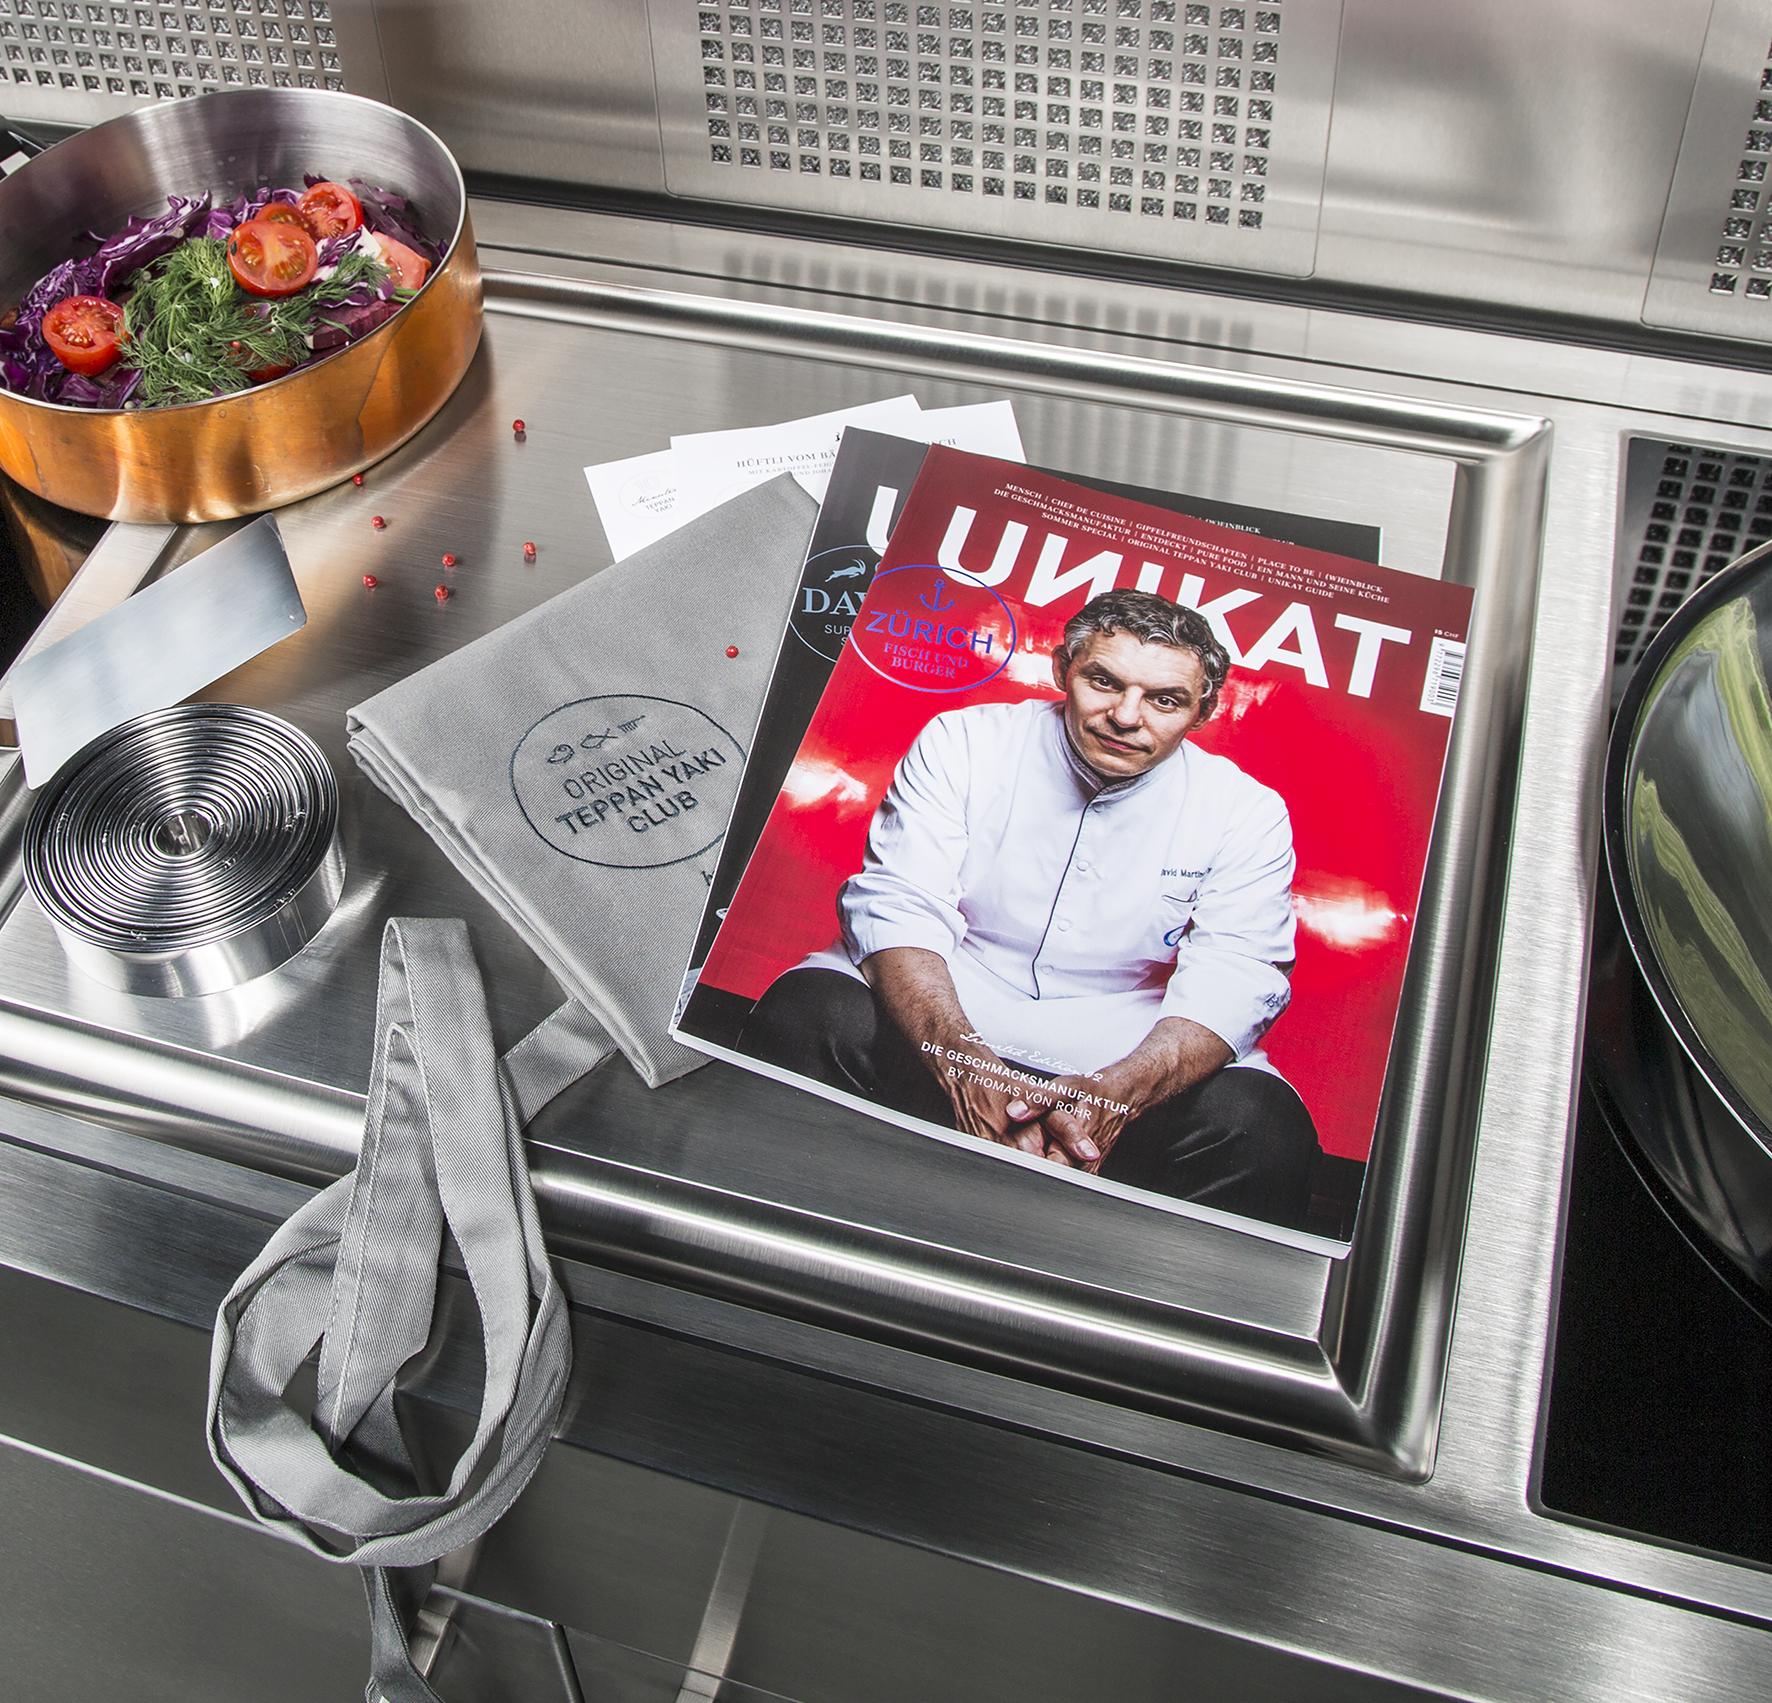 uppergrade-publishing-unikat-magazin01.jpg